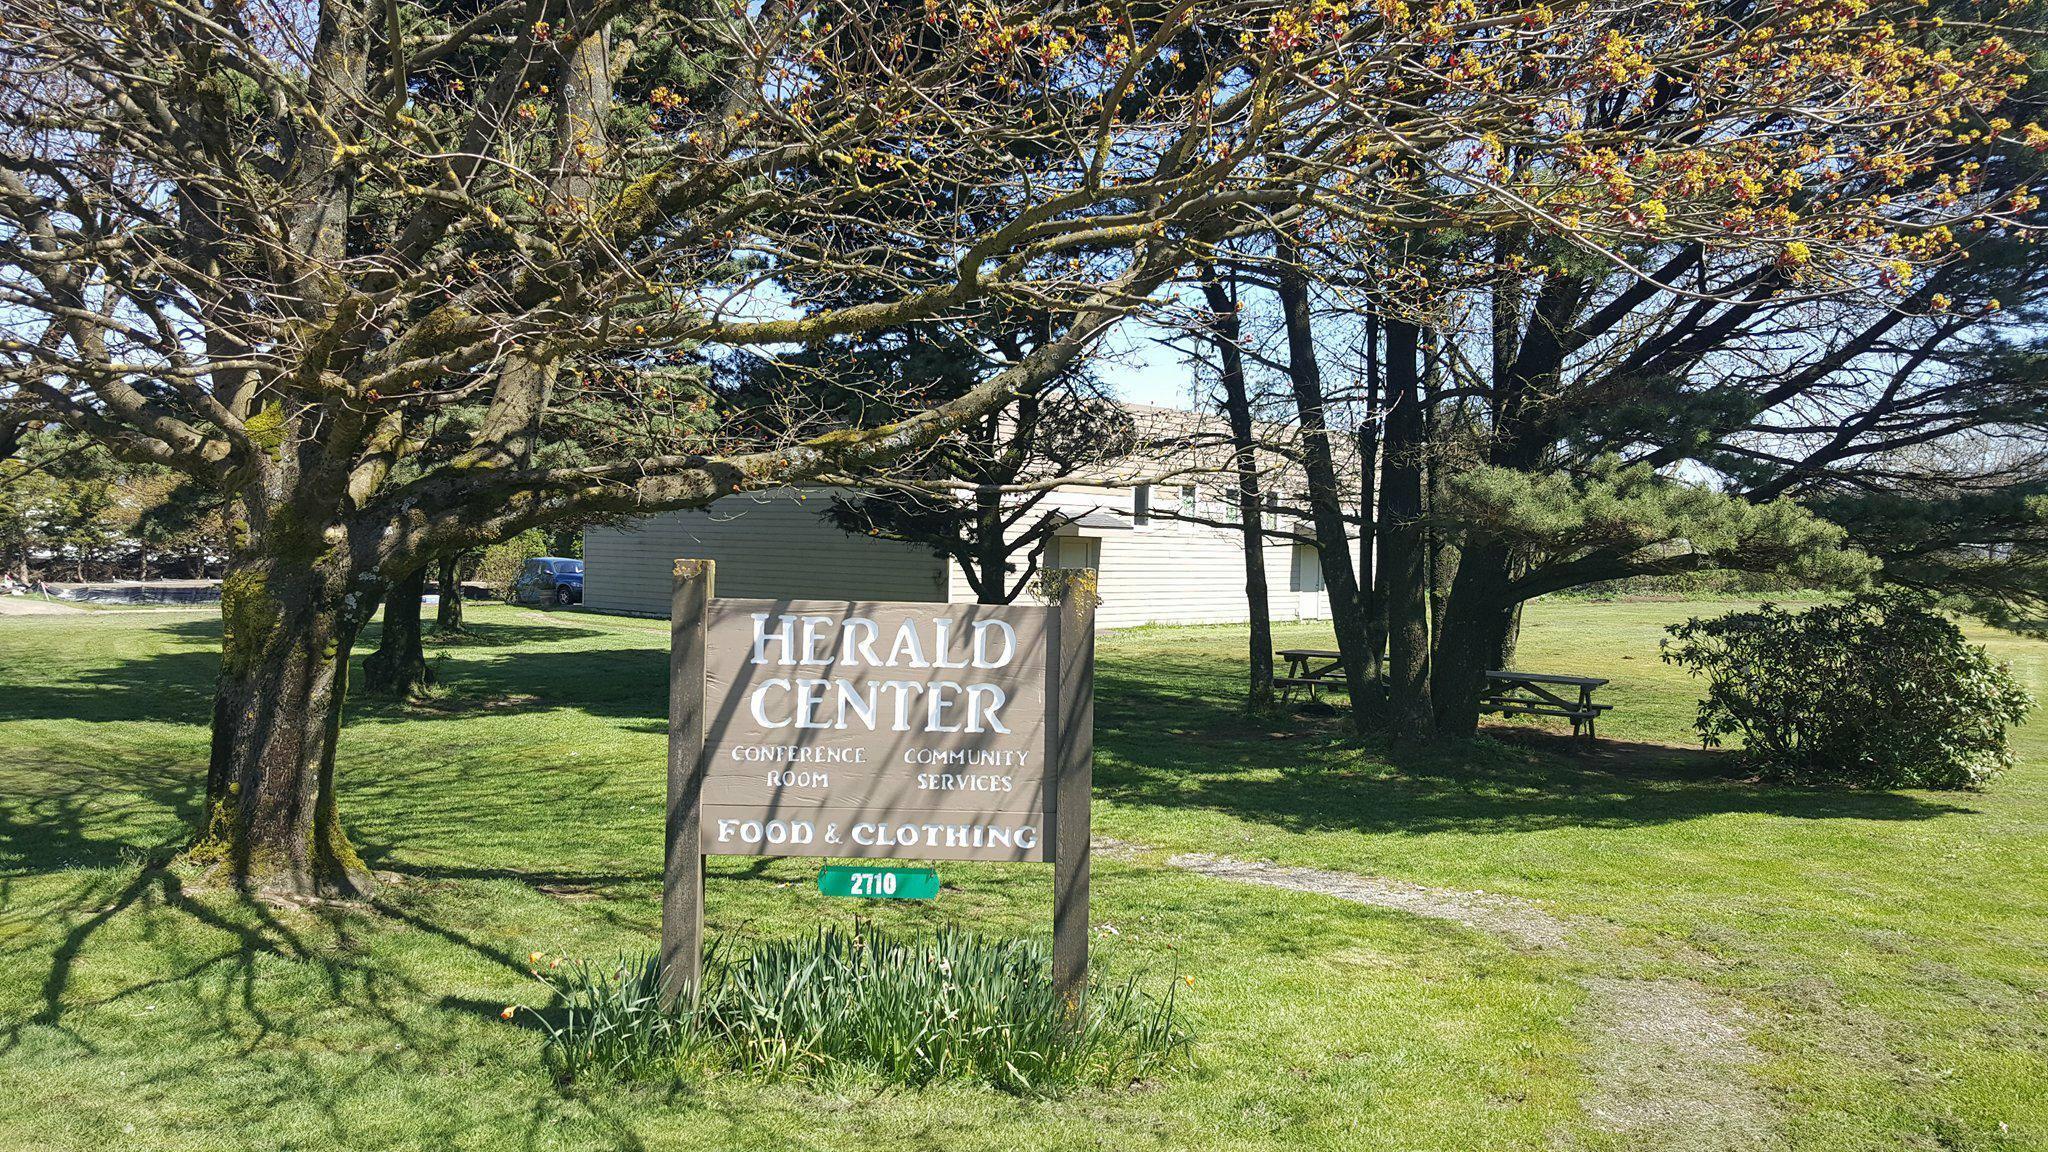 Seventh Day Adventist Community Services - Herald Center